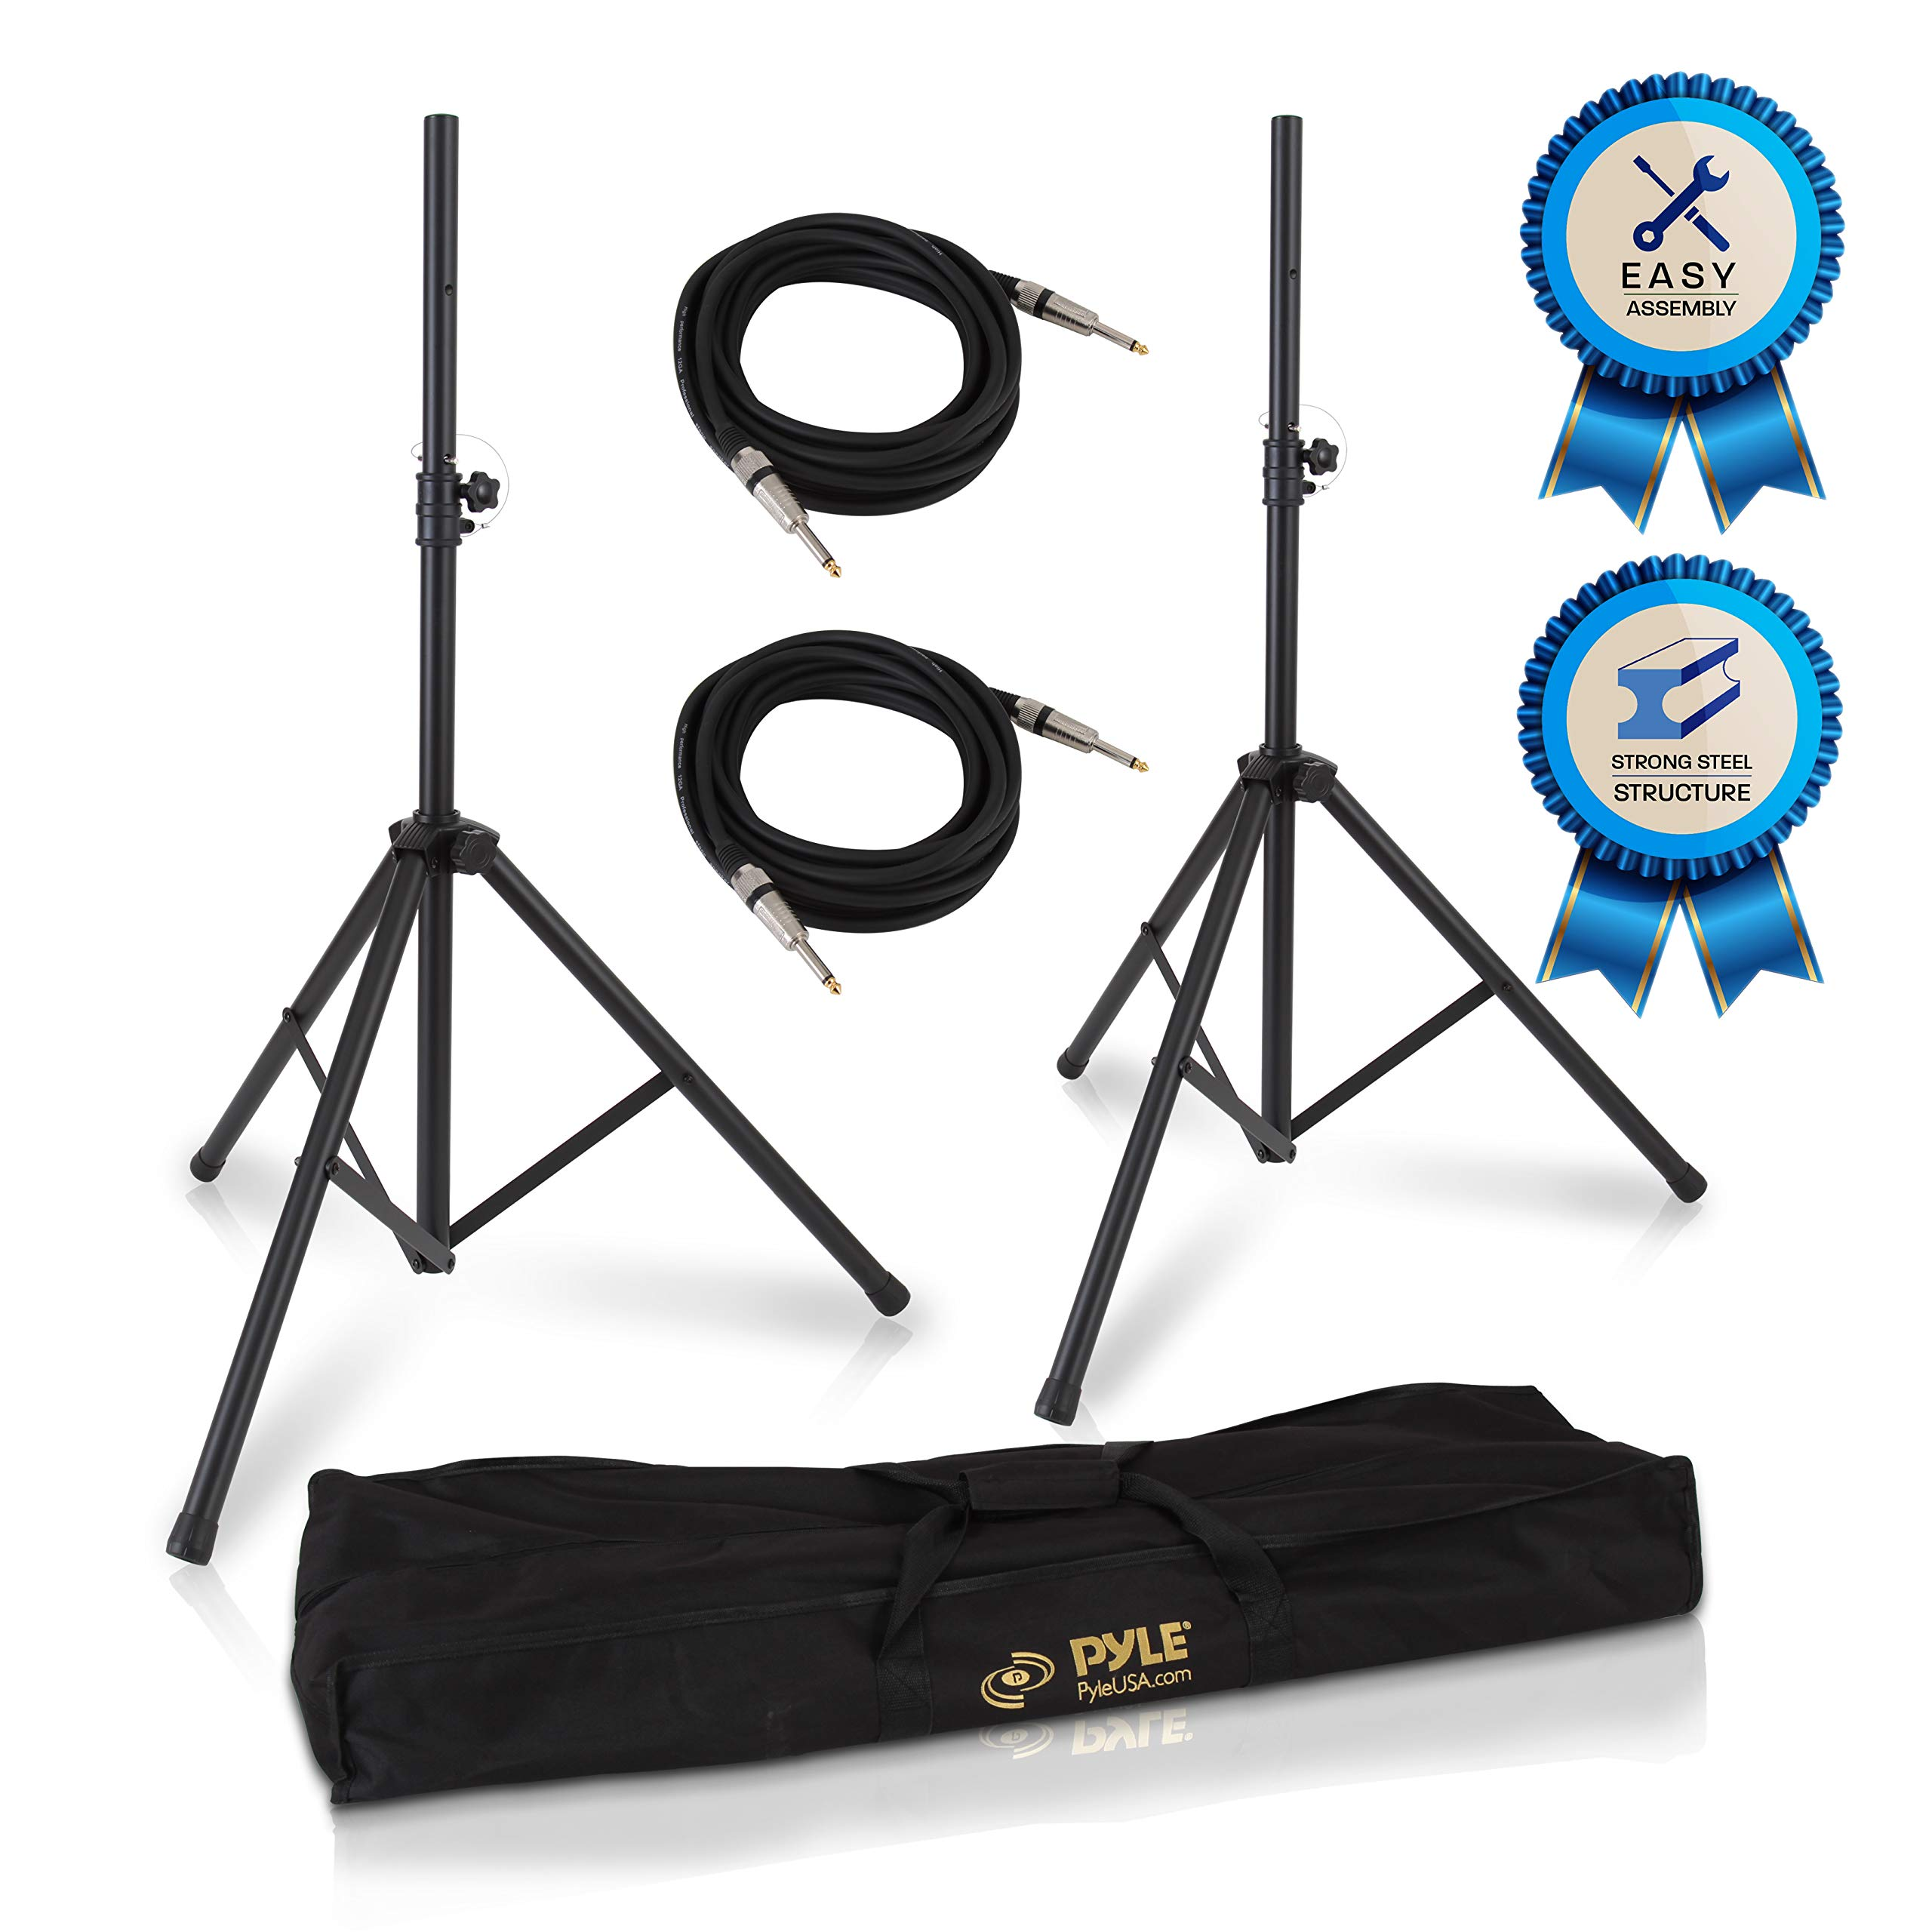 Pyle Stage & Studio DJ Speaker Stand Kit - Pro Audio PA Loudspeaker Stands & Audio Cable, Storage Bag, 1/4'' -inch Connector (PMDK102)